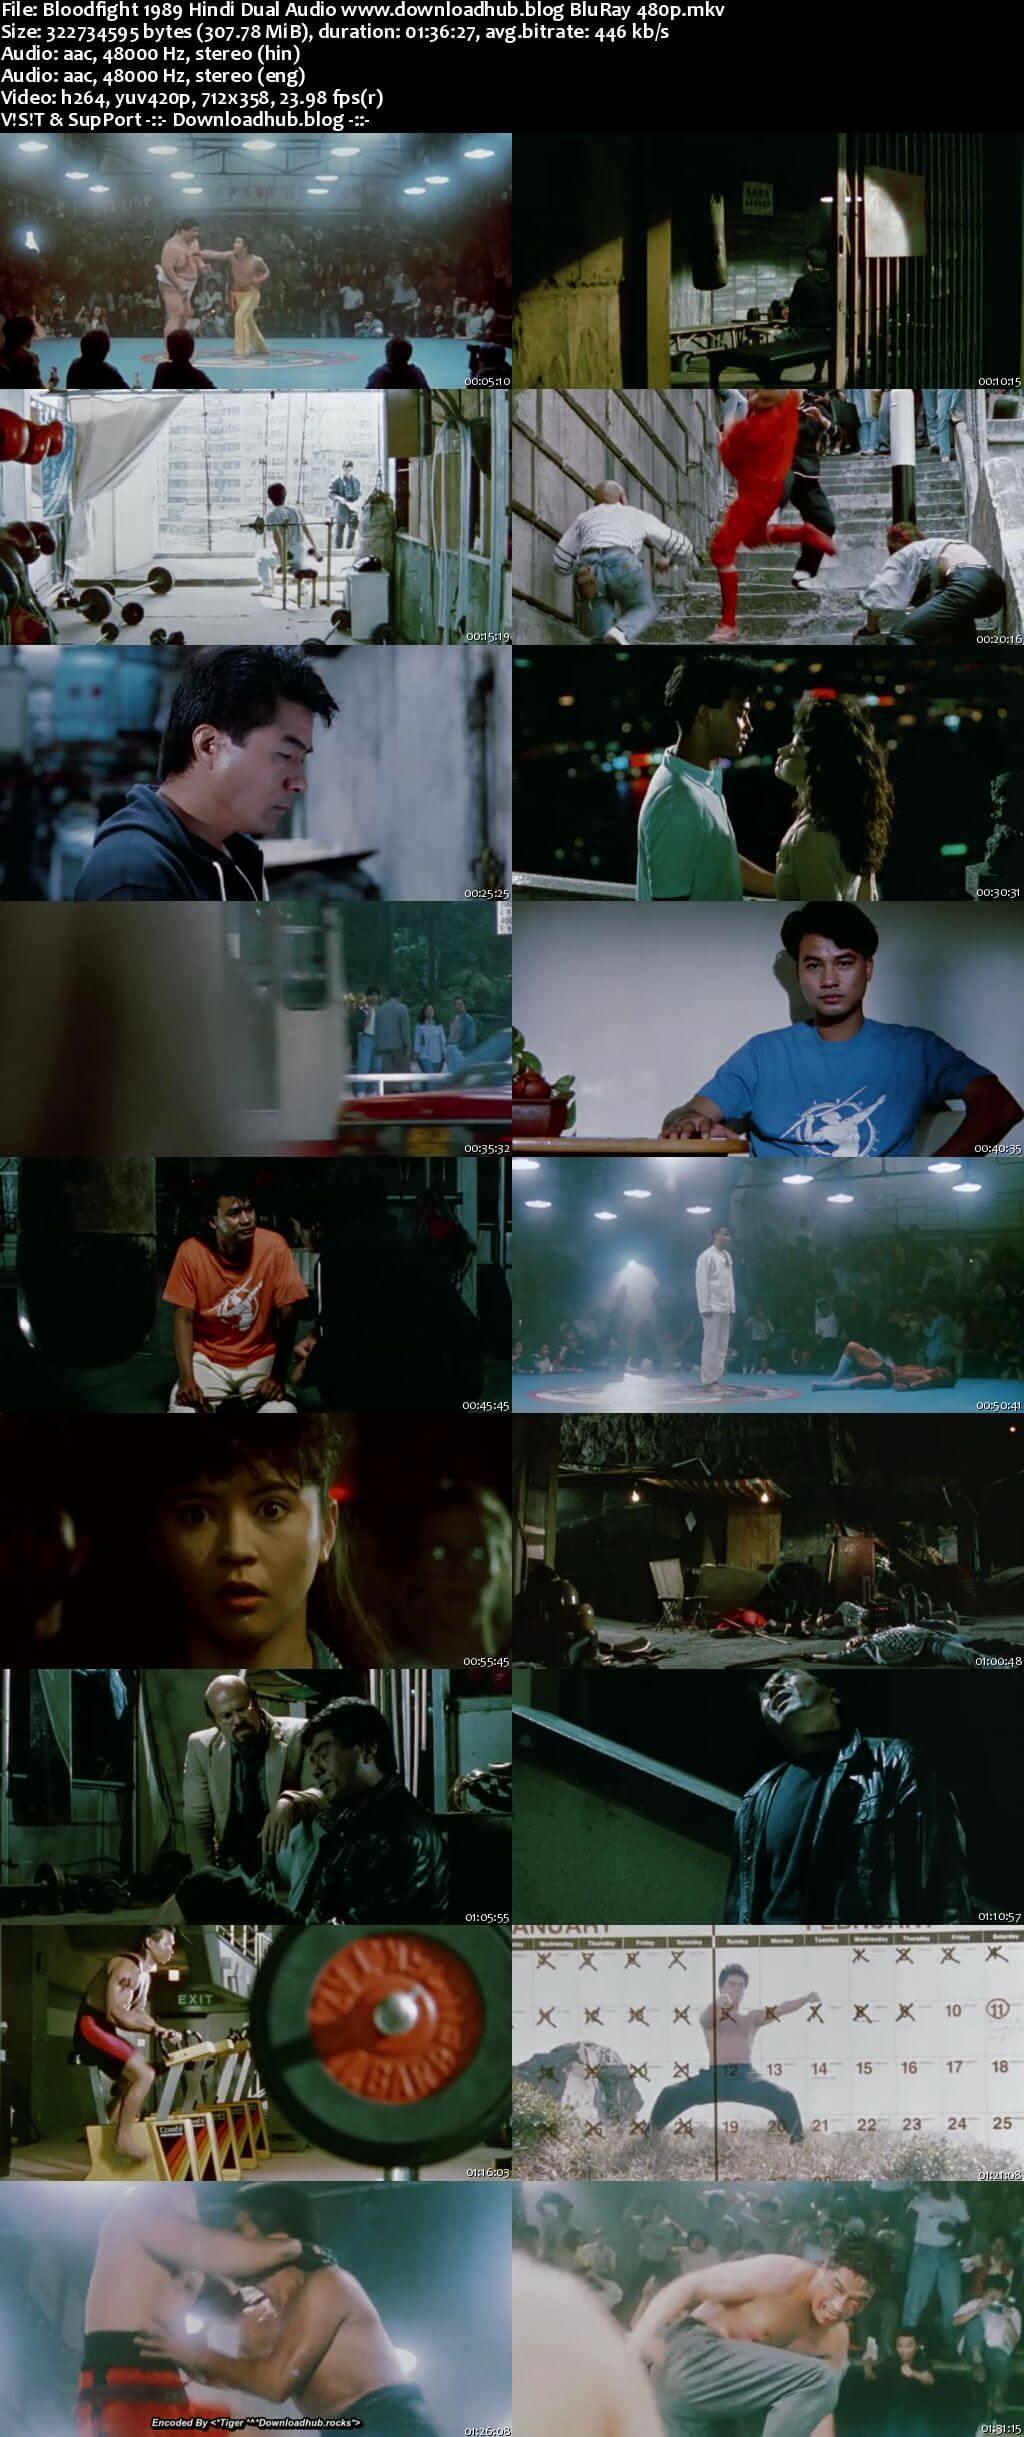 Bloodfight 1989 Hindi Dual Audio 300MB BluRay 480p